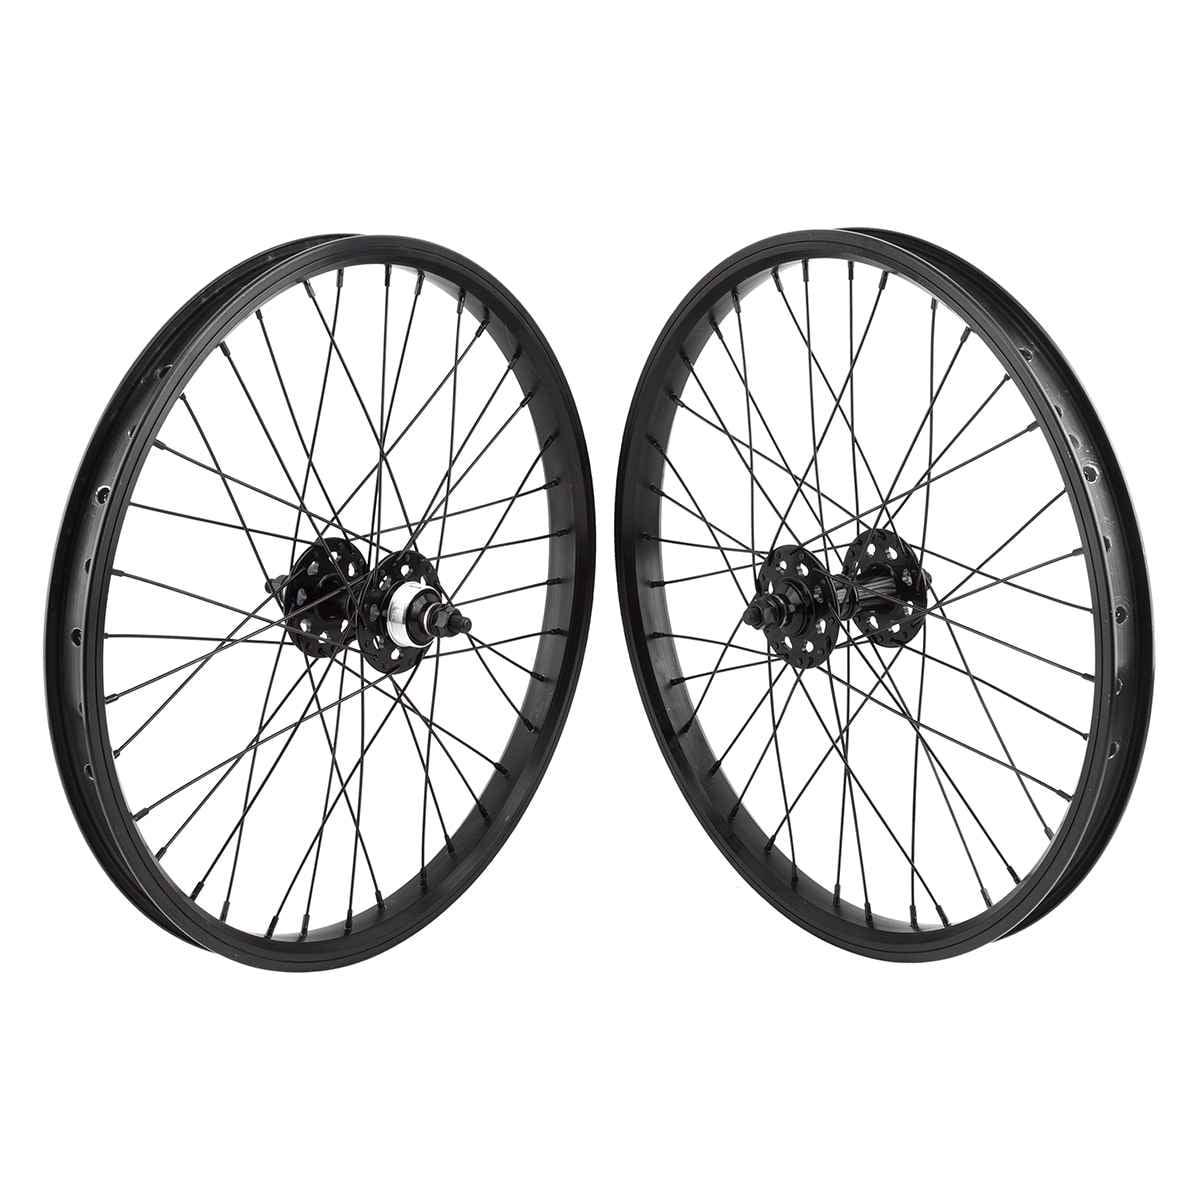 SE Bikes Whl Pr 20X1.75 406X24 Se Racing Bk 36 Se Racing ...